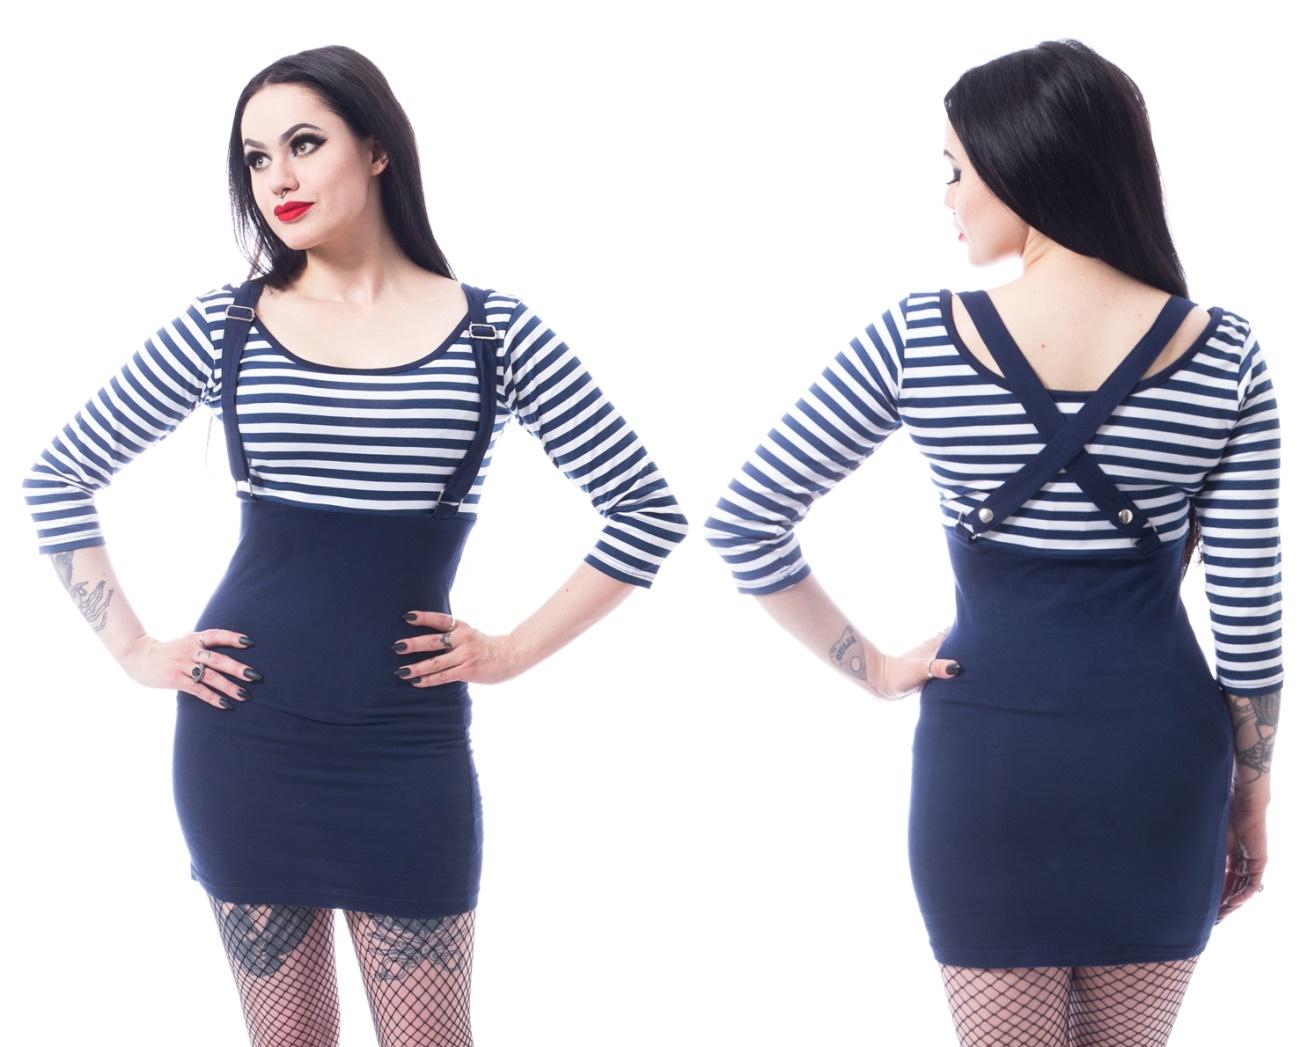 26a3e49a511117 Stretchkleid im Matrosenstil Sailor Dress Rockabella - Rockabella ...